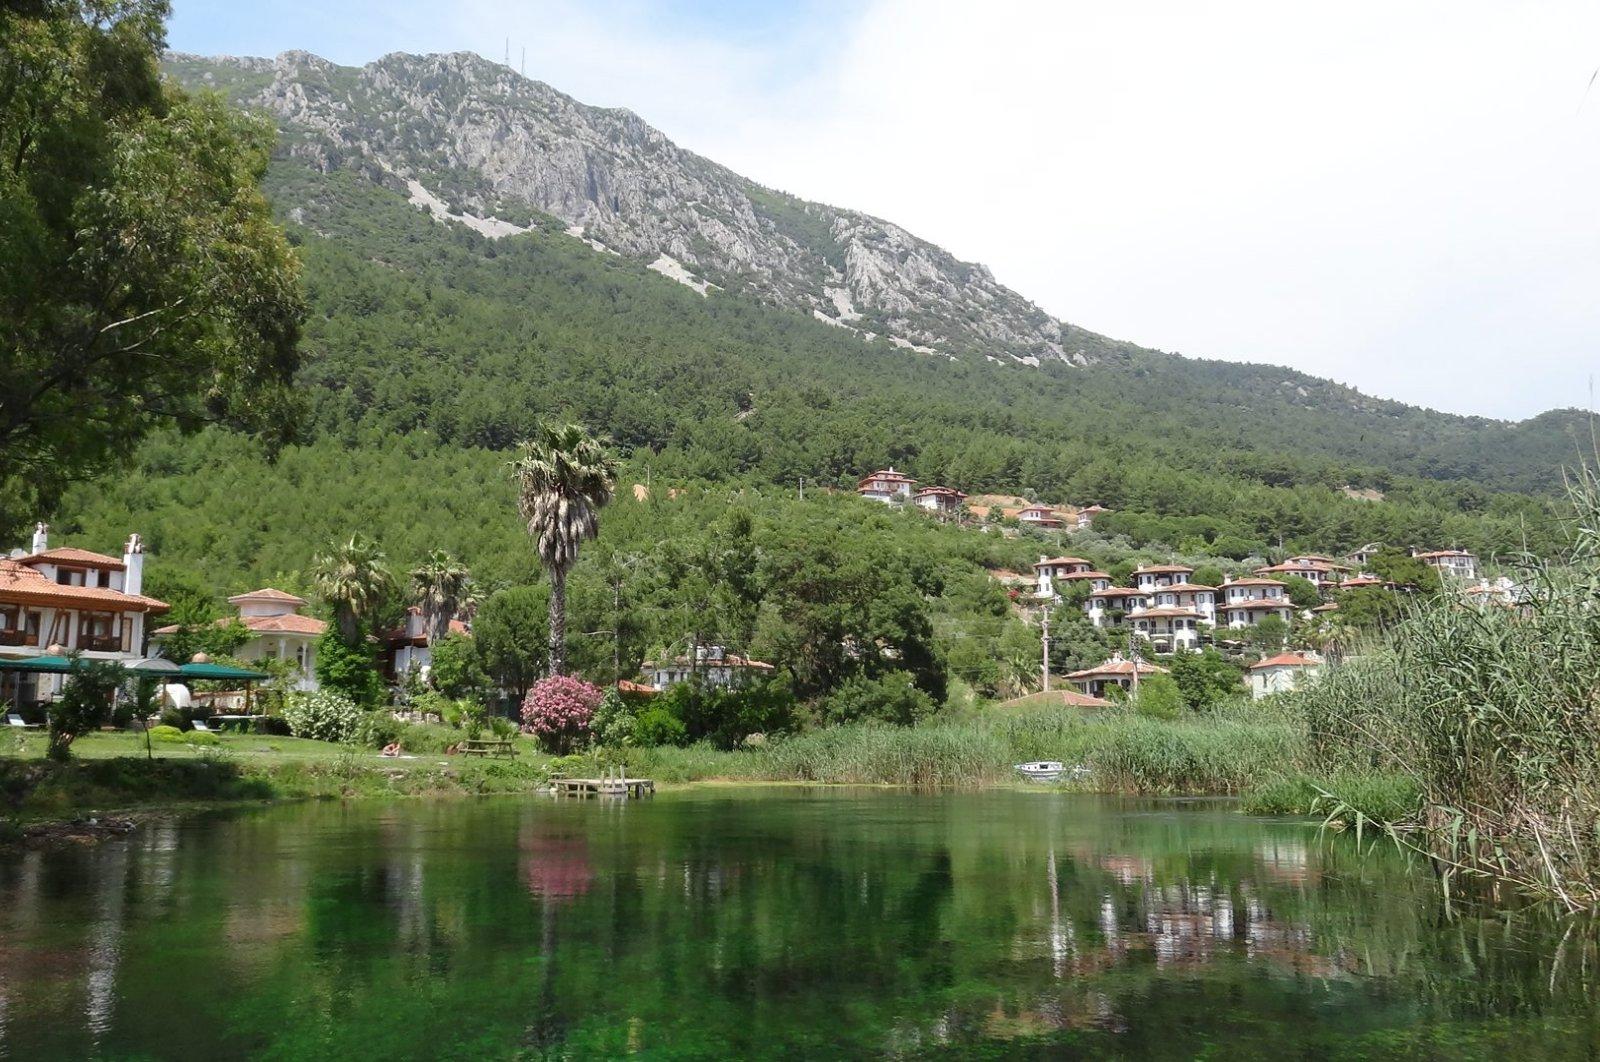 Akyaka on the Azmak River in Muğla, Turkey. (Sabah File Photo)